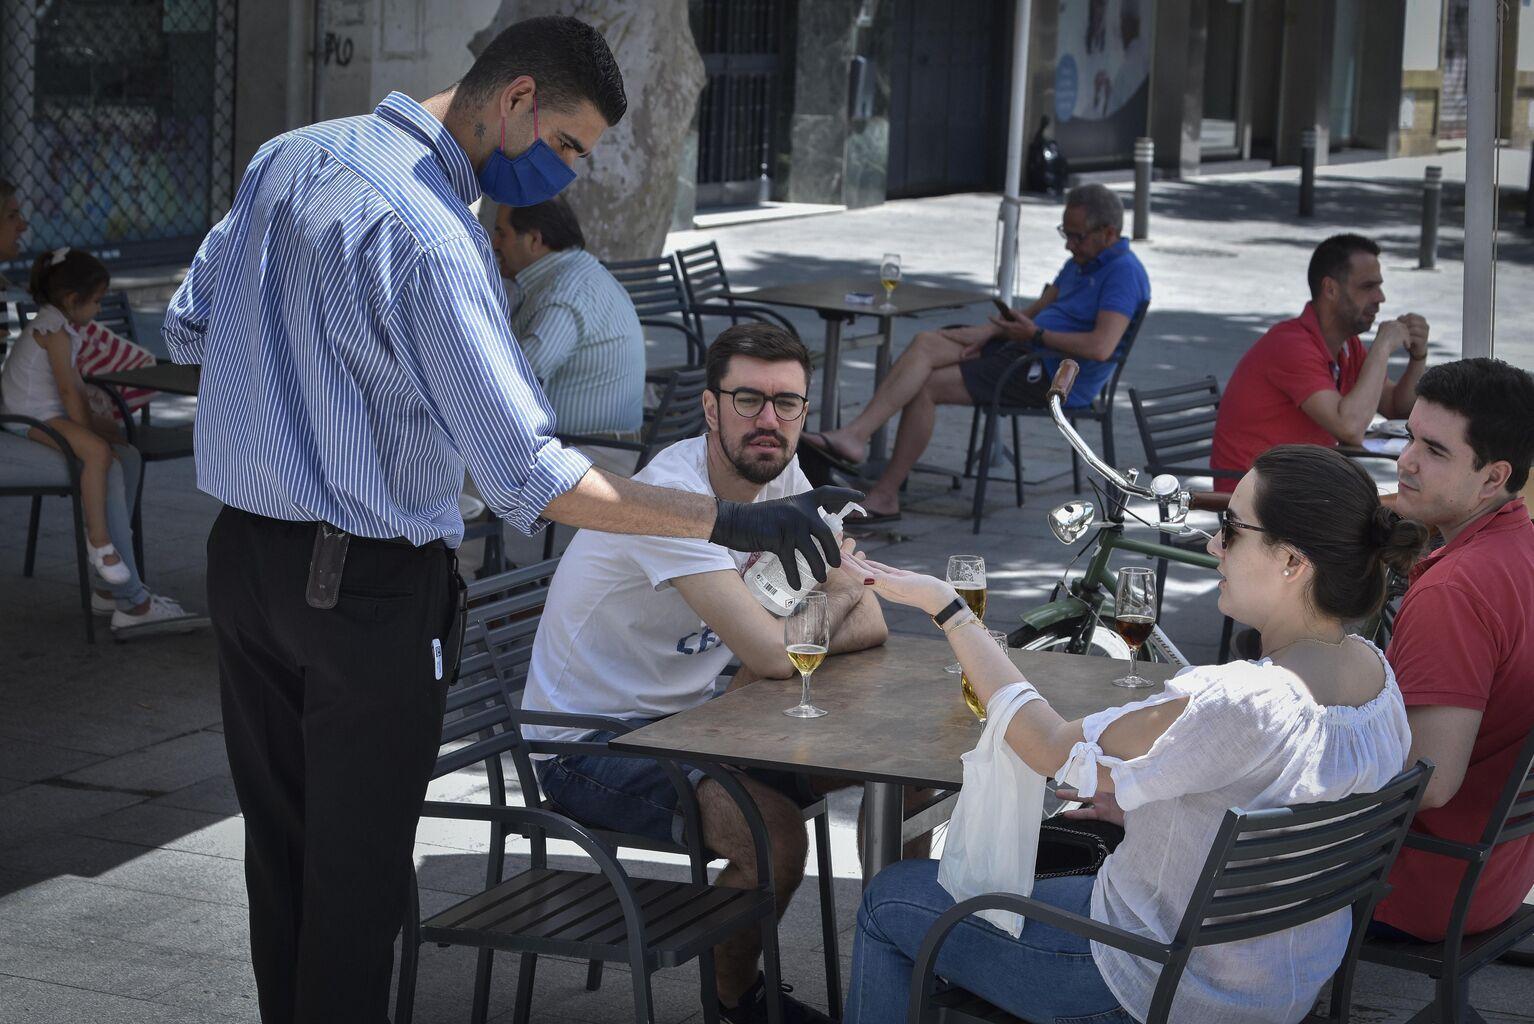 Medio centenar de bares logran ampliar su terraza de veladores